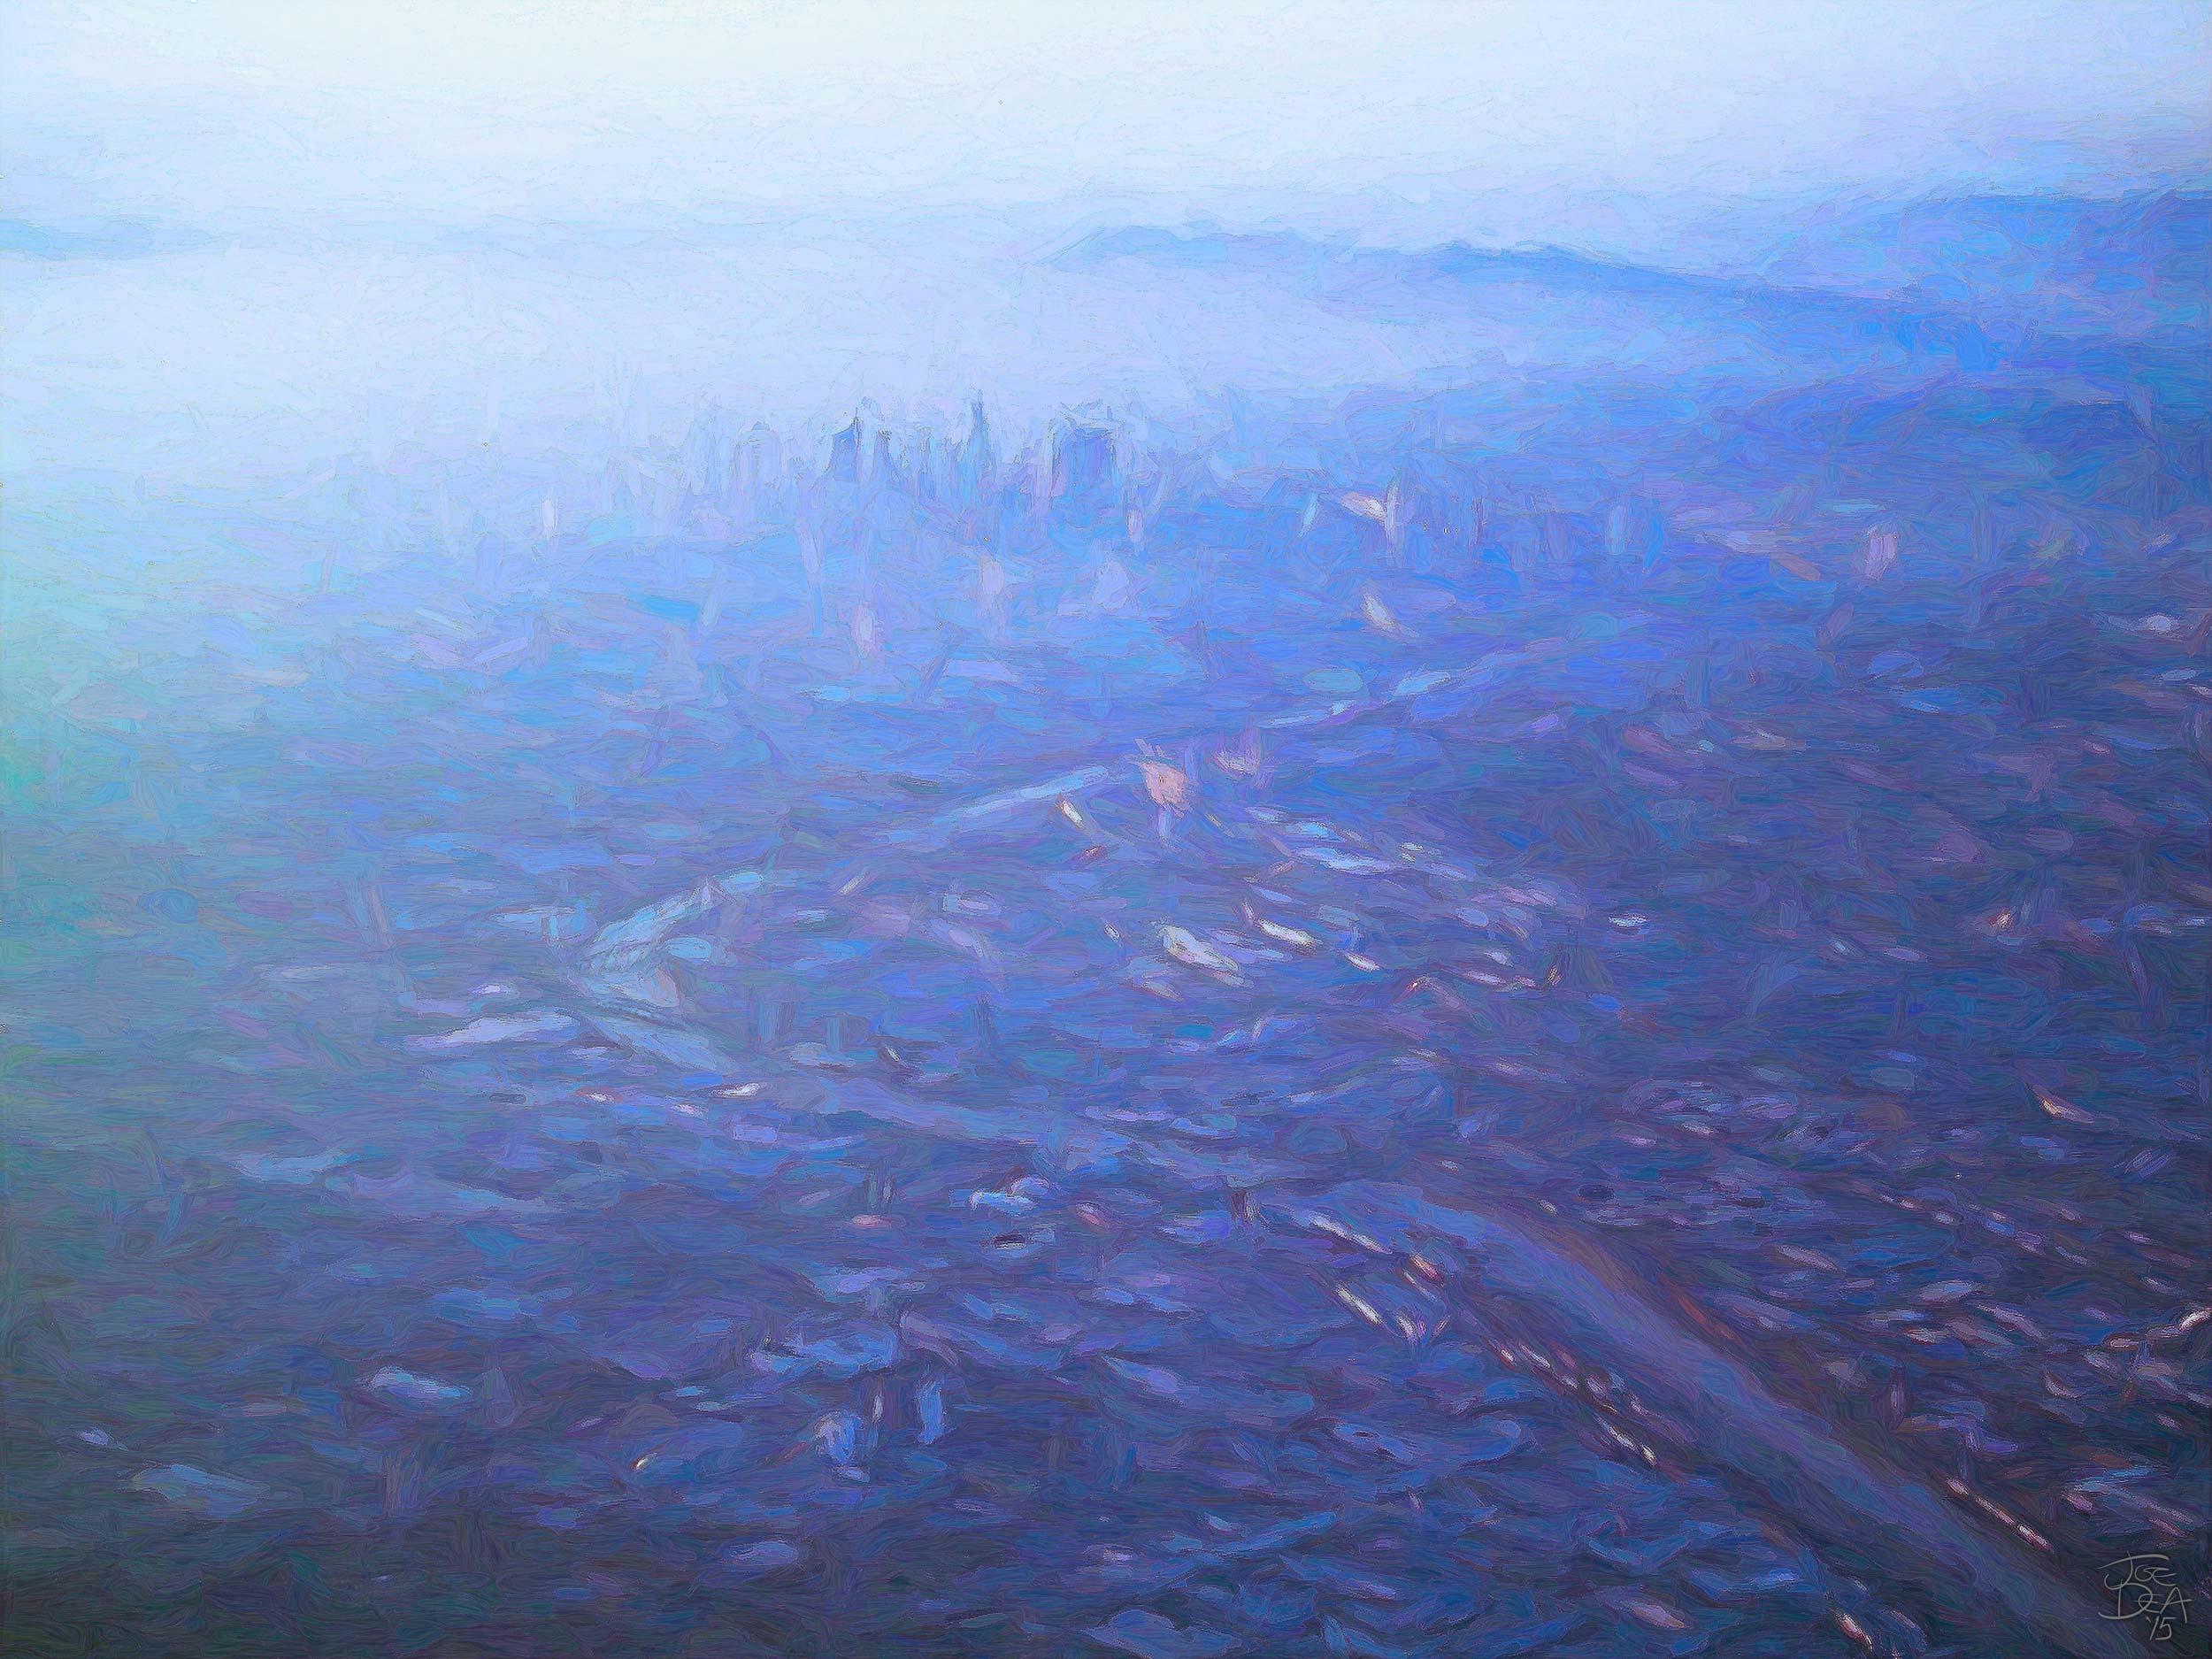 Joe-Dea-LA-Downtown-Aerial-painting-web-LB1.jpg